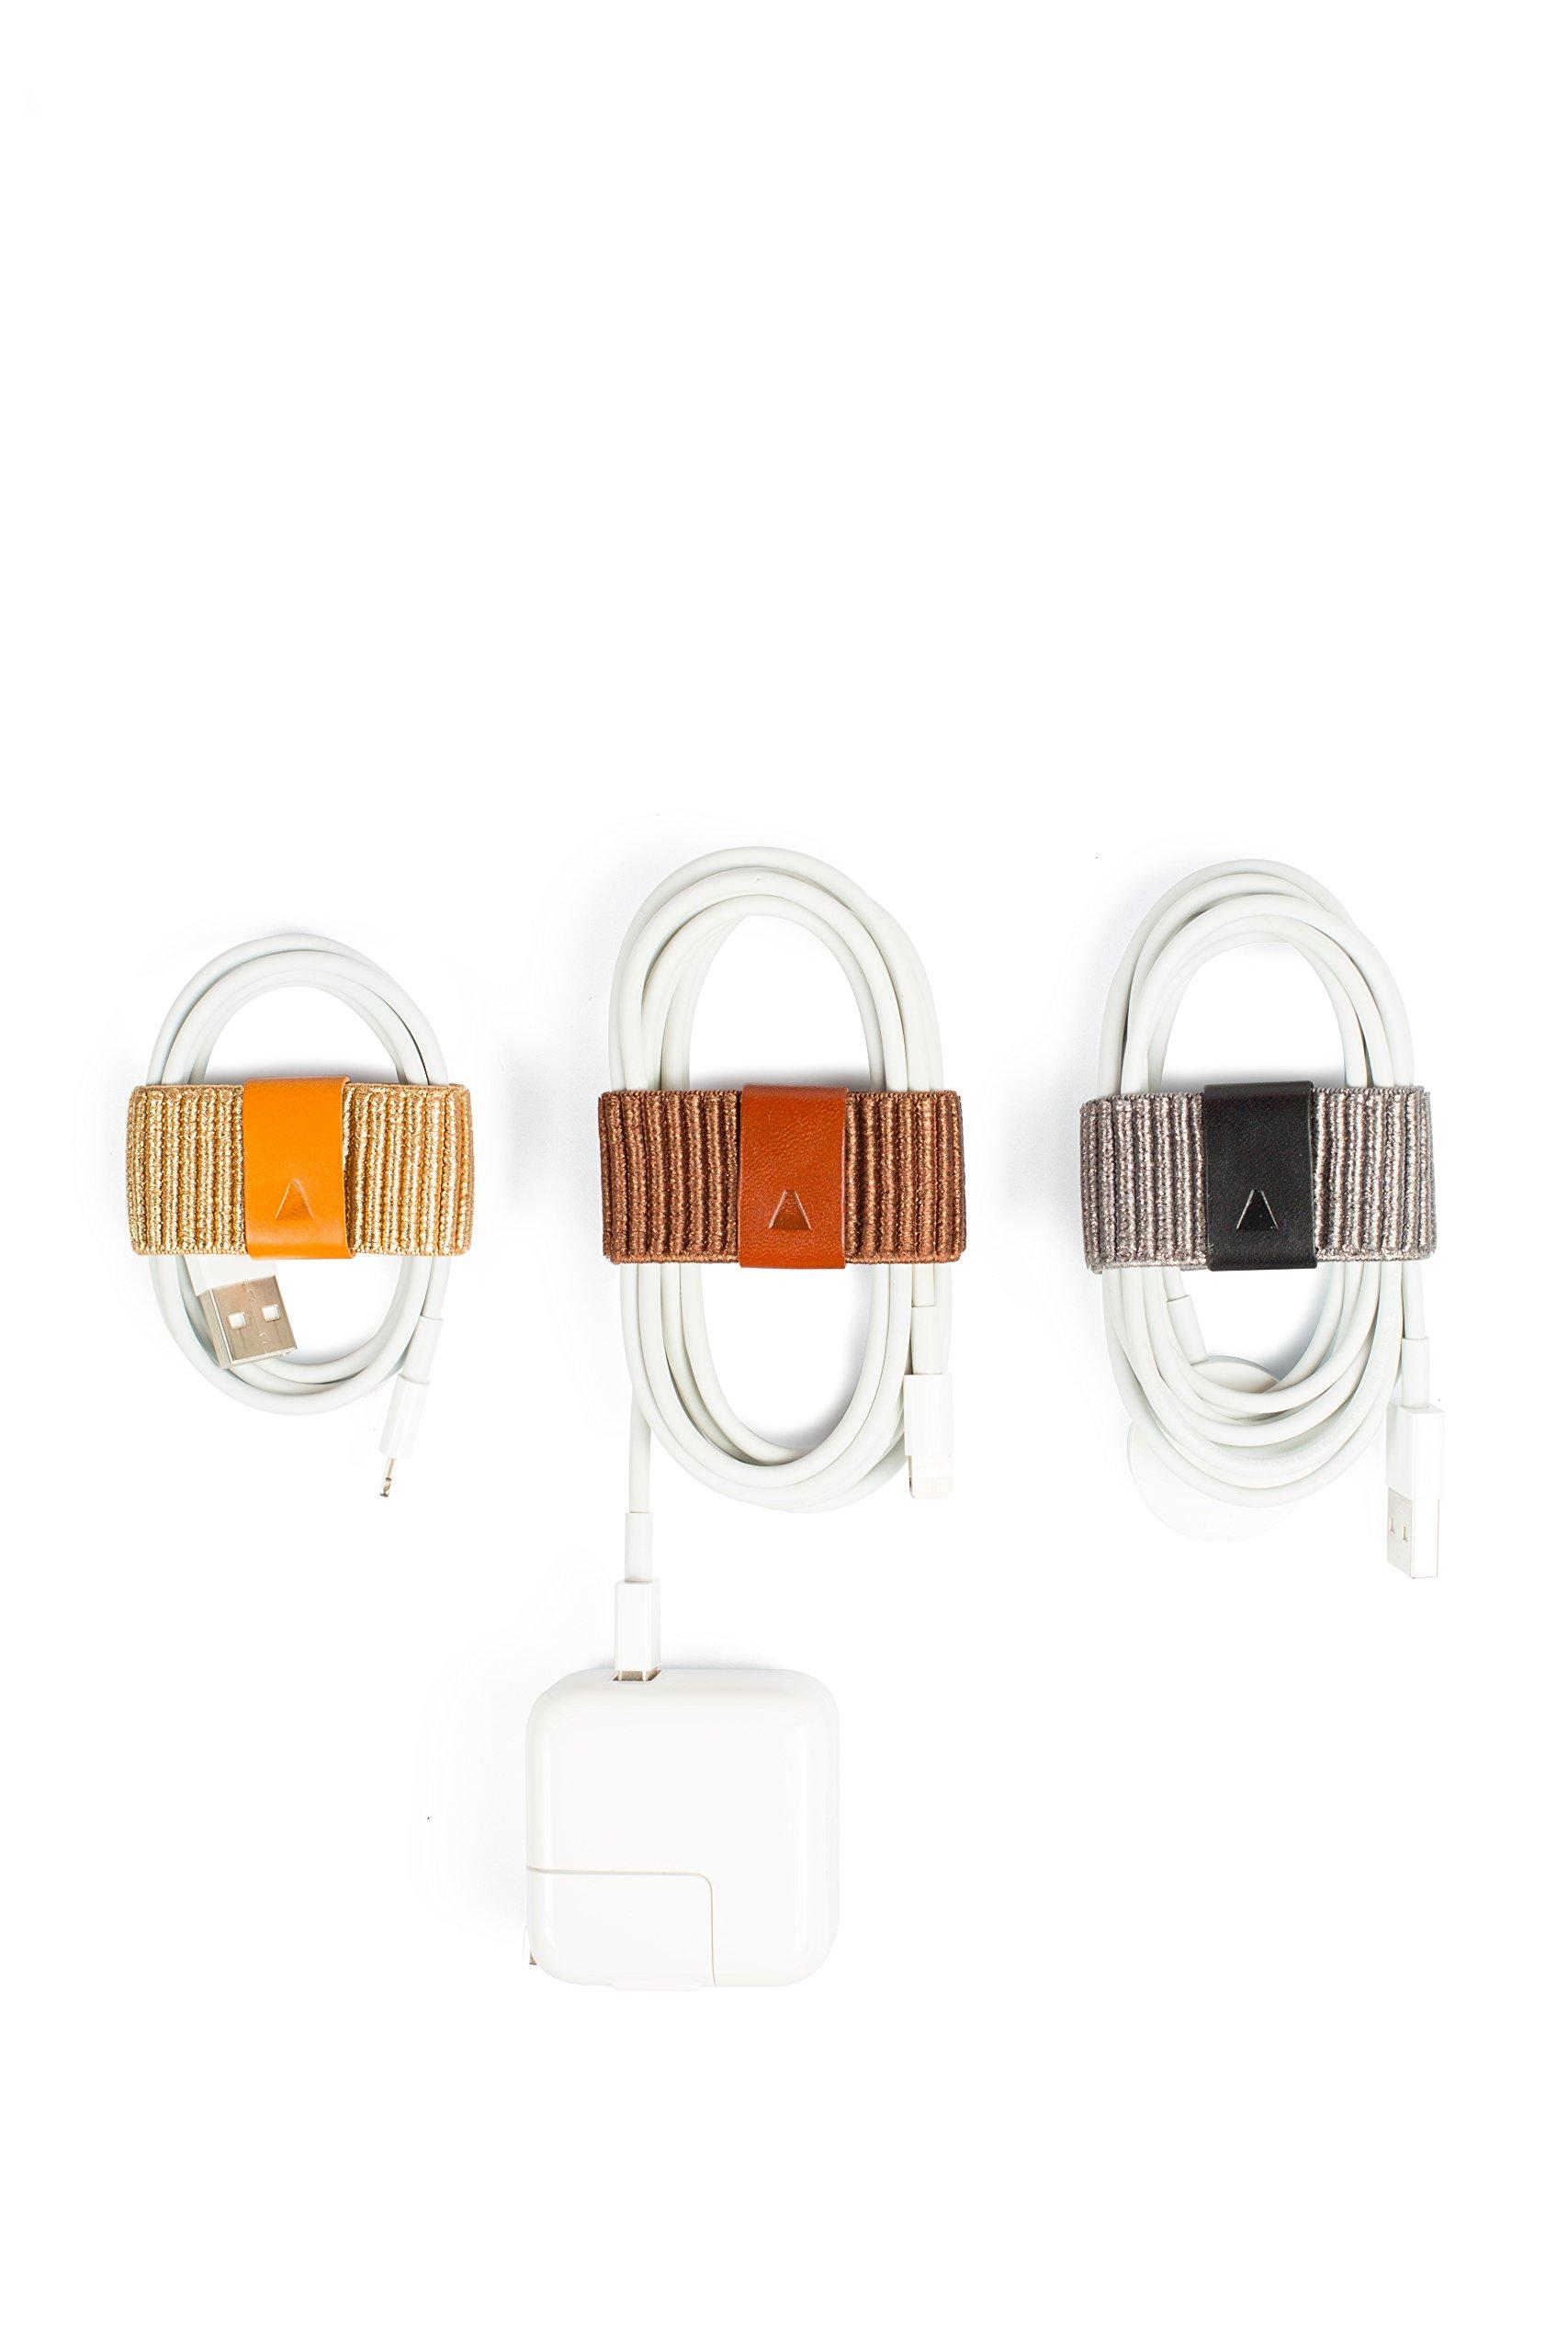 CableBand Multi-purpose Cable Organizer Set (Metallic)